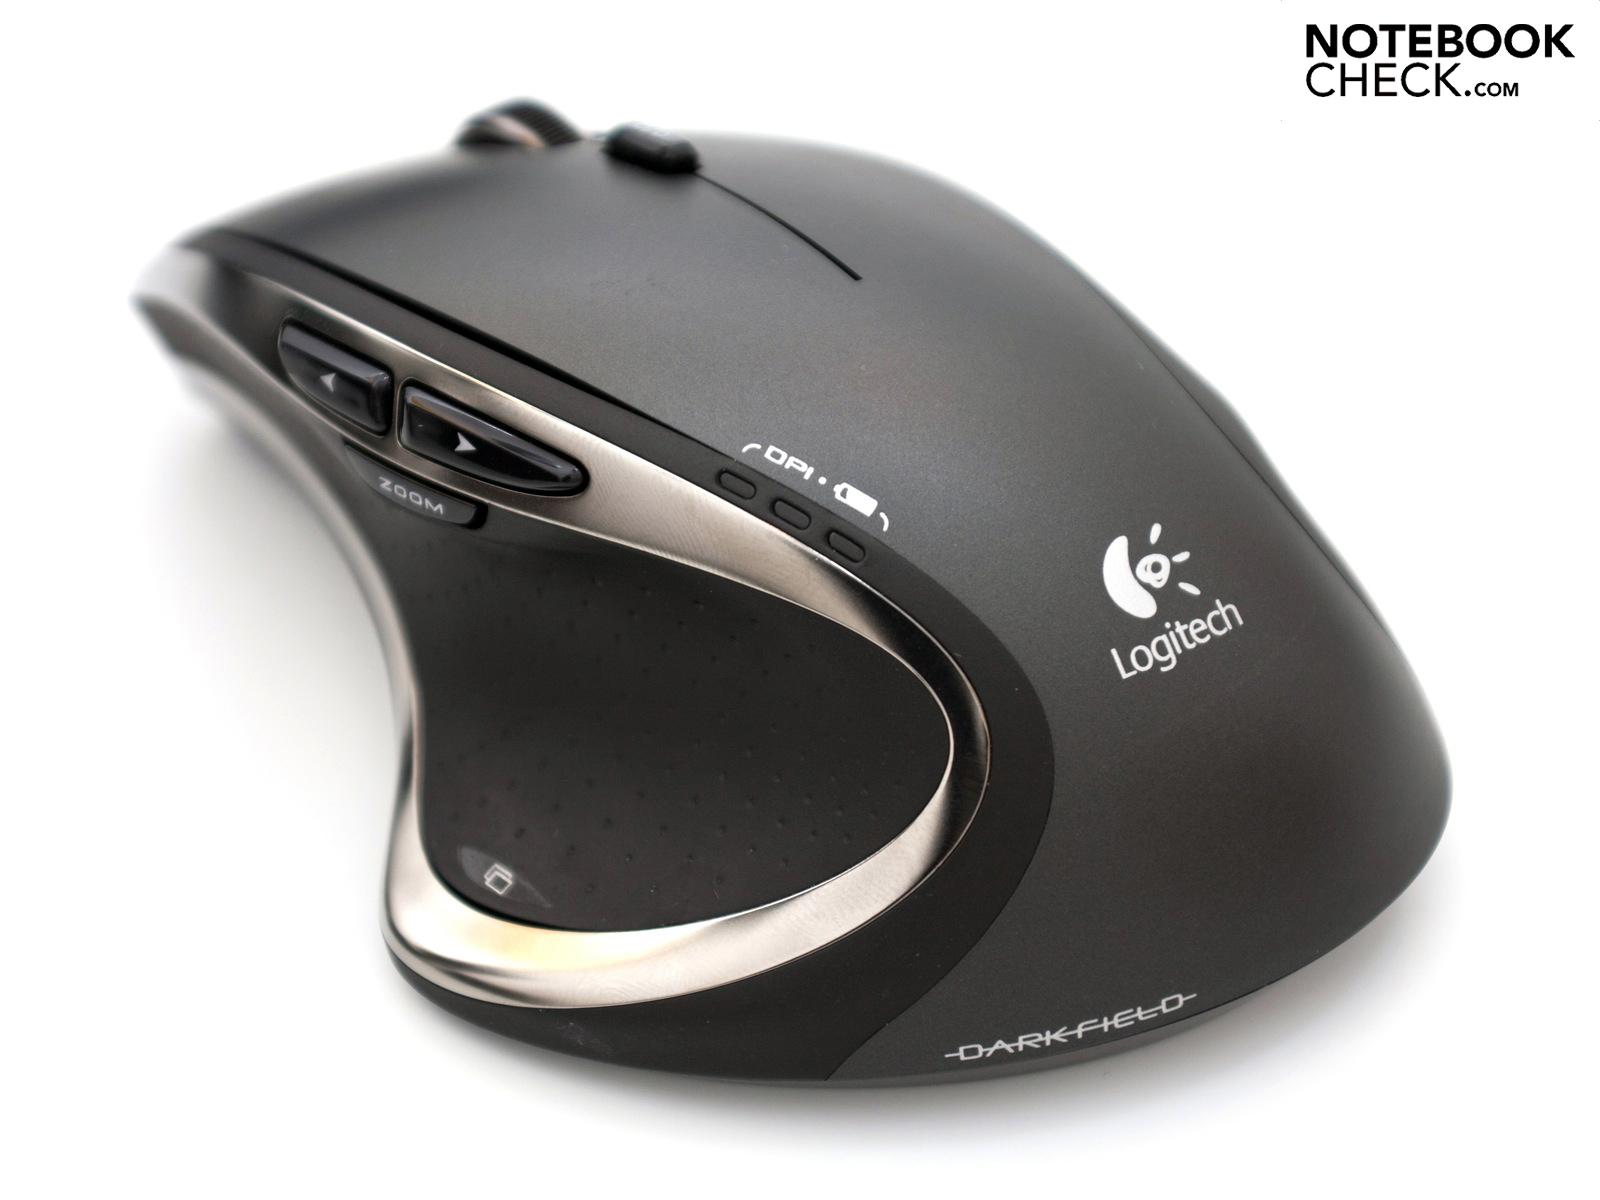 Review Logitech Performance Mouse MX - NotebookCheck.net Reviews